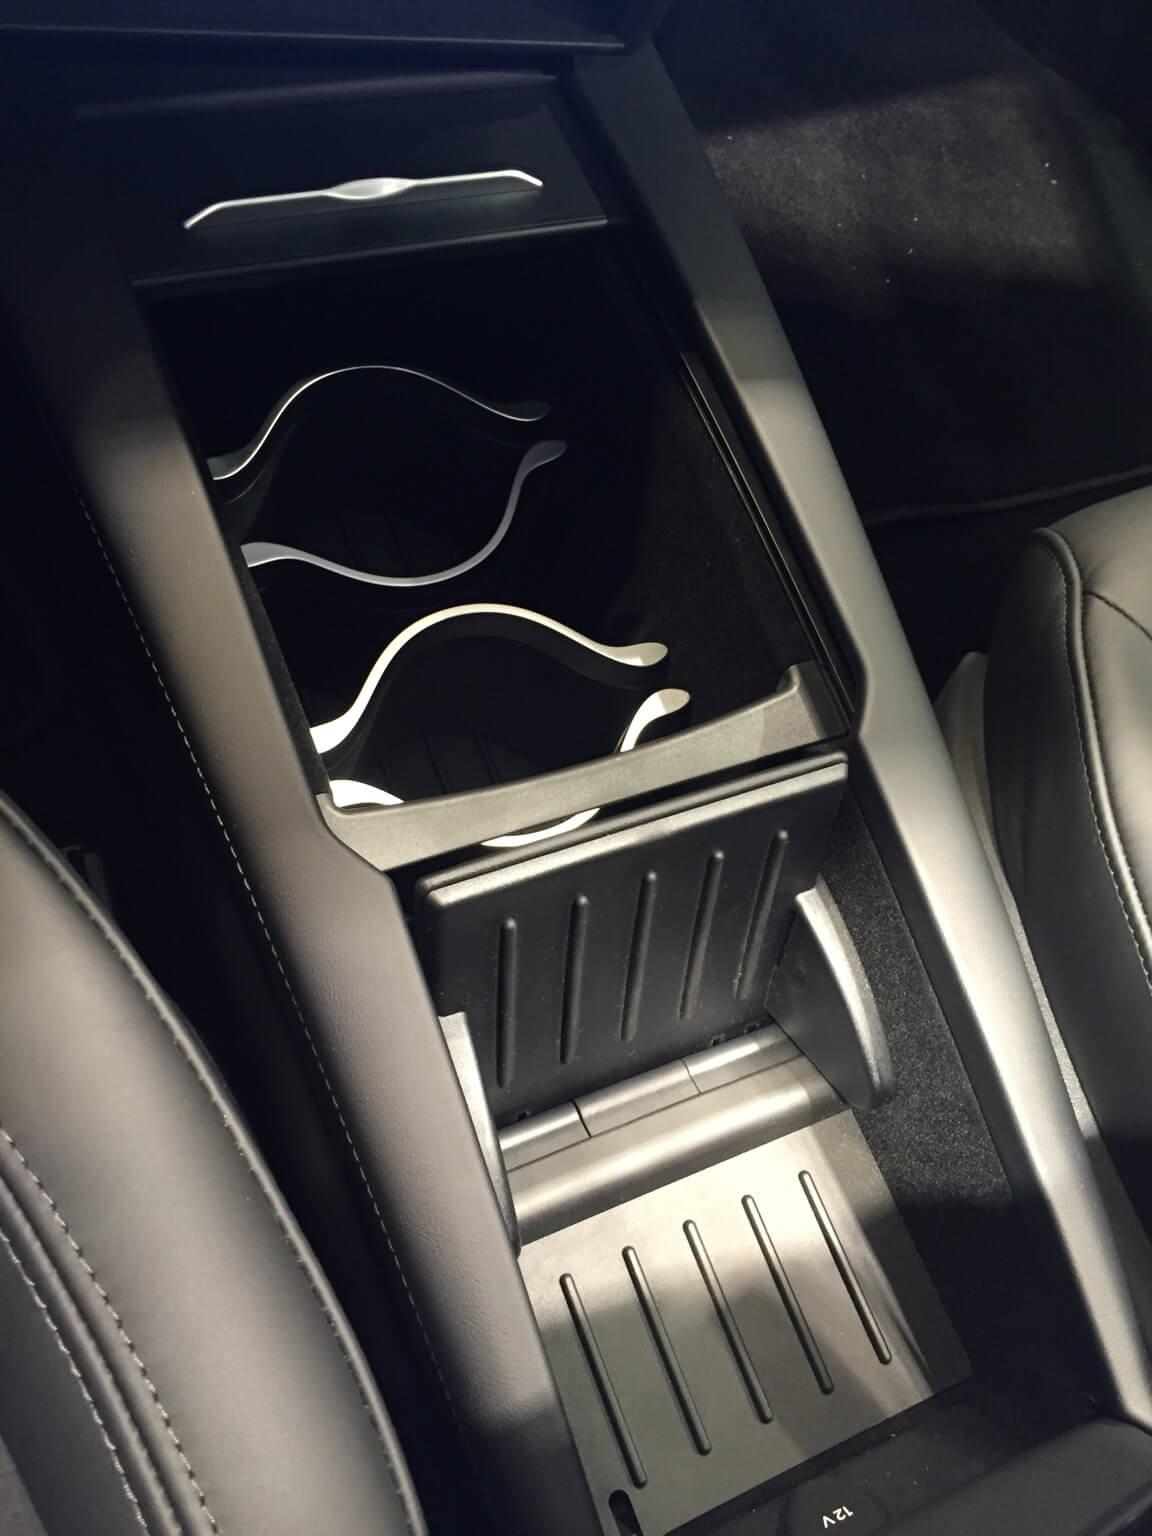 Jede Menge Bilder Vom Neuen Model S Aus Dem M 252 Nchener Store Gt Teslamag De